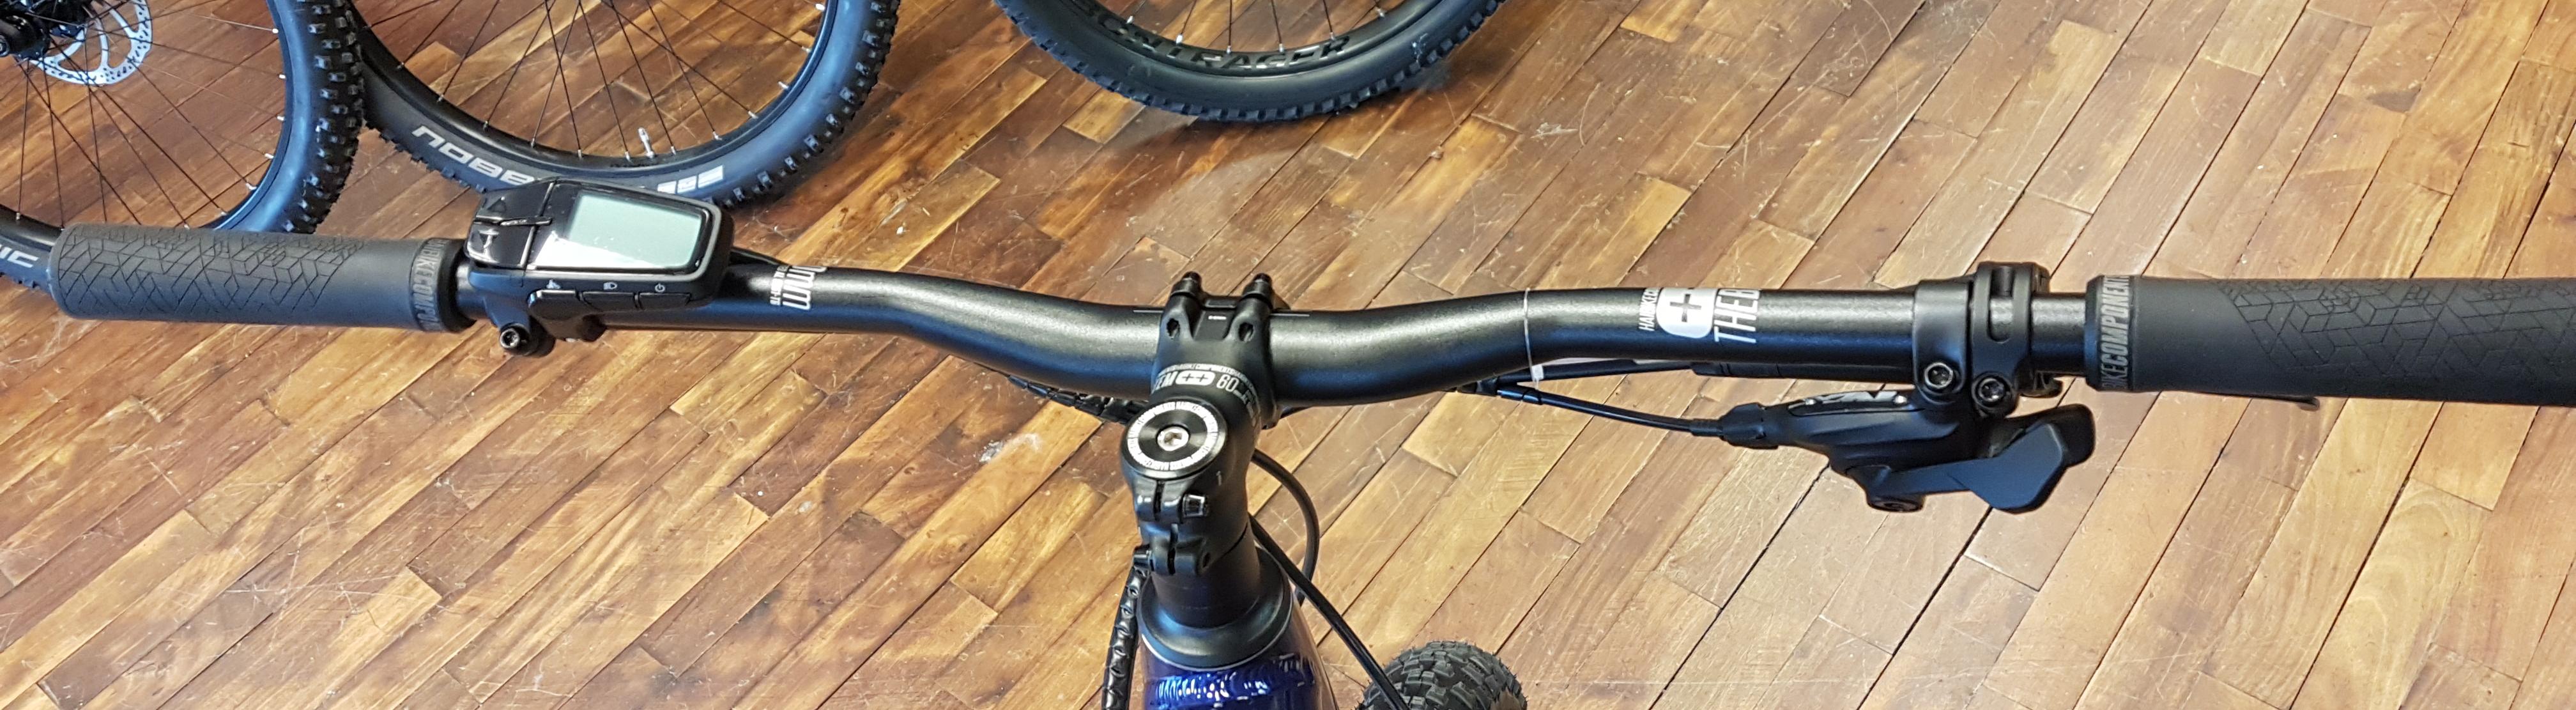 réglage cintre vélo